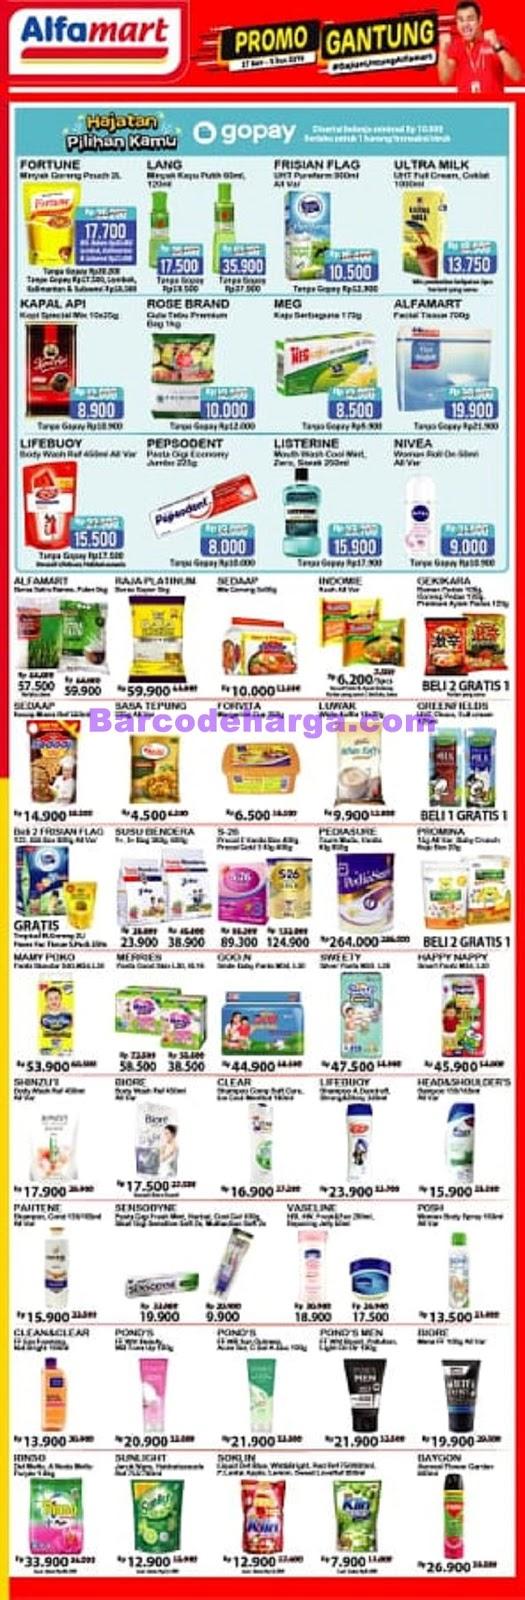 Katalog Promo Alfamart Payday 23 Februari 3 Maret 2020 Barcodeharga Harga Promo Alfamart Indomaret Giant Hypermart Superindo Lottemart Carrefour